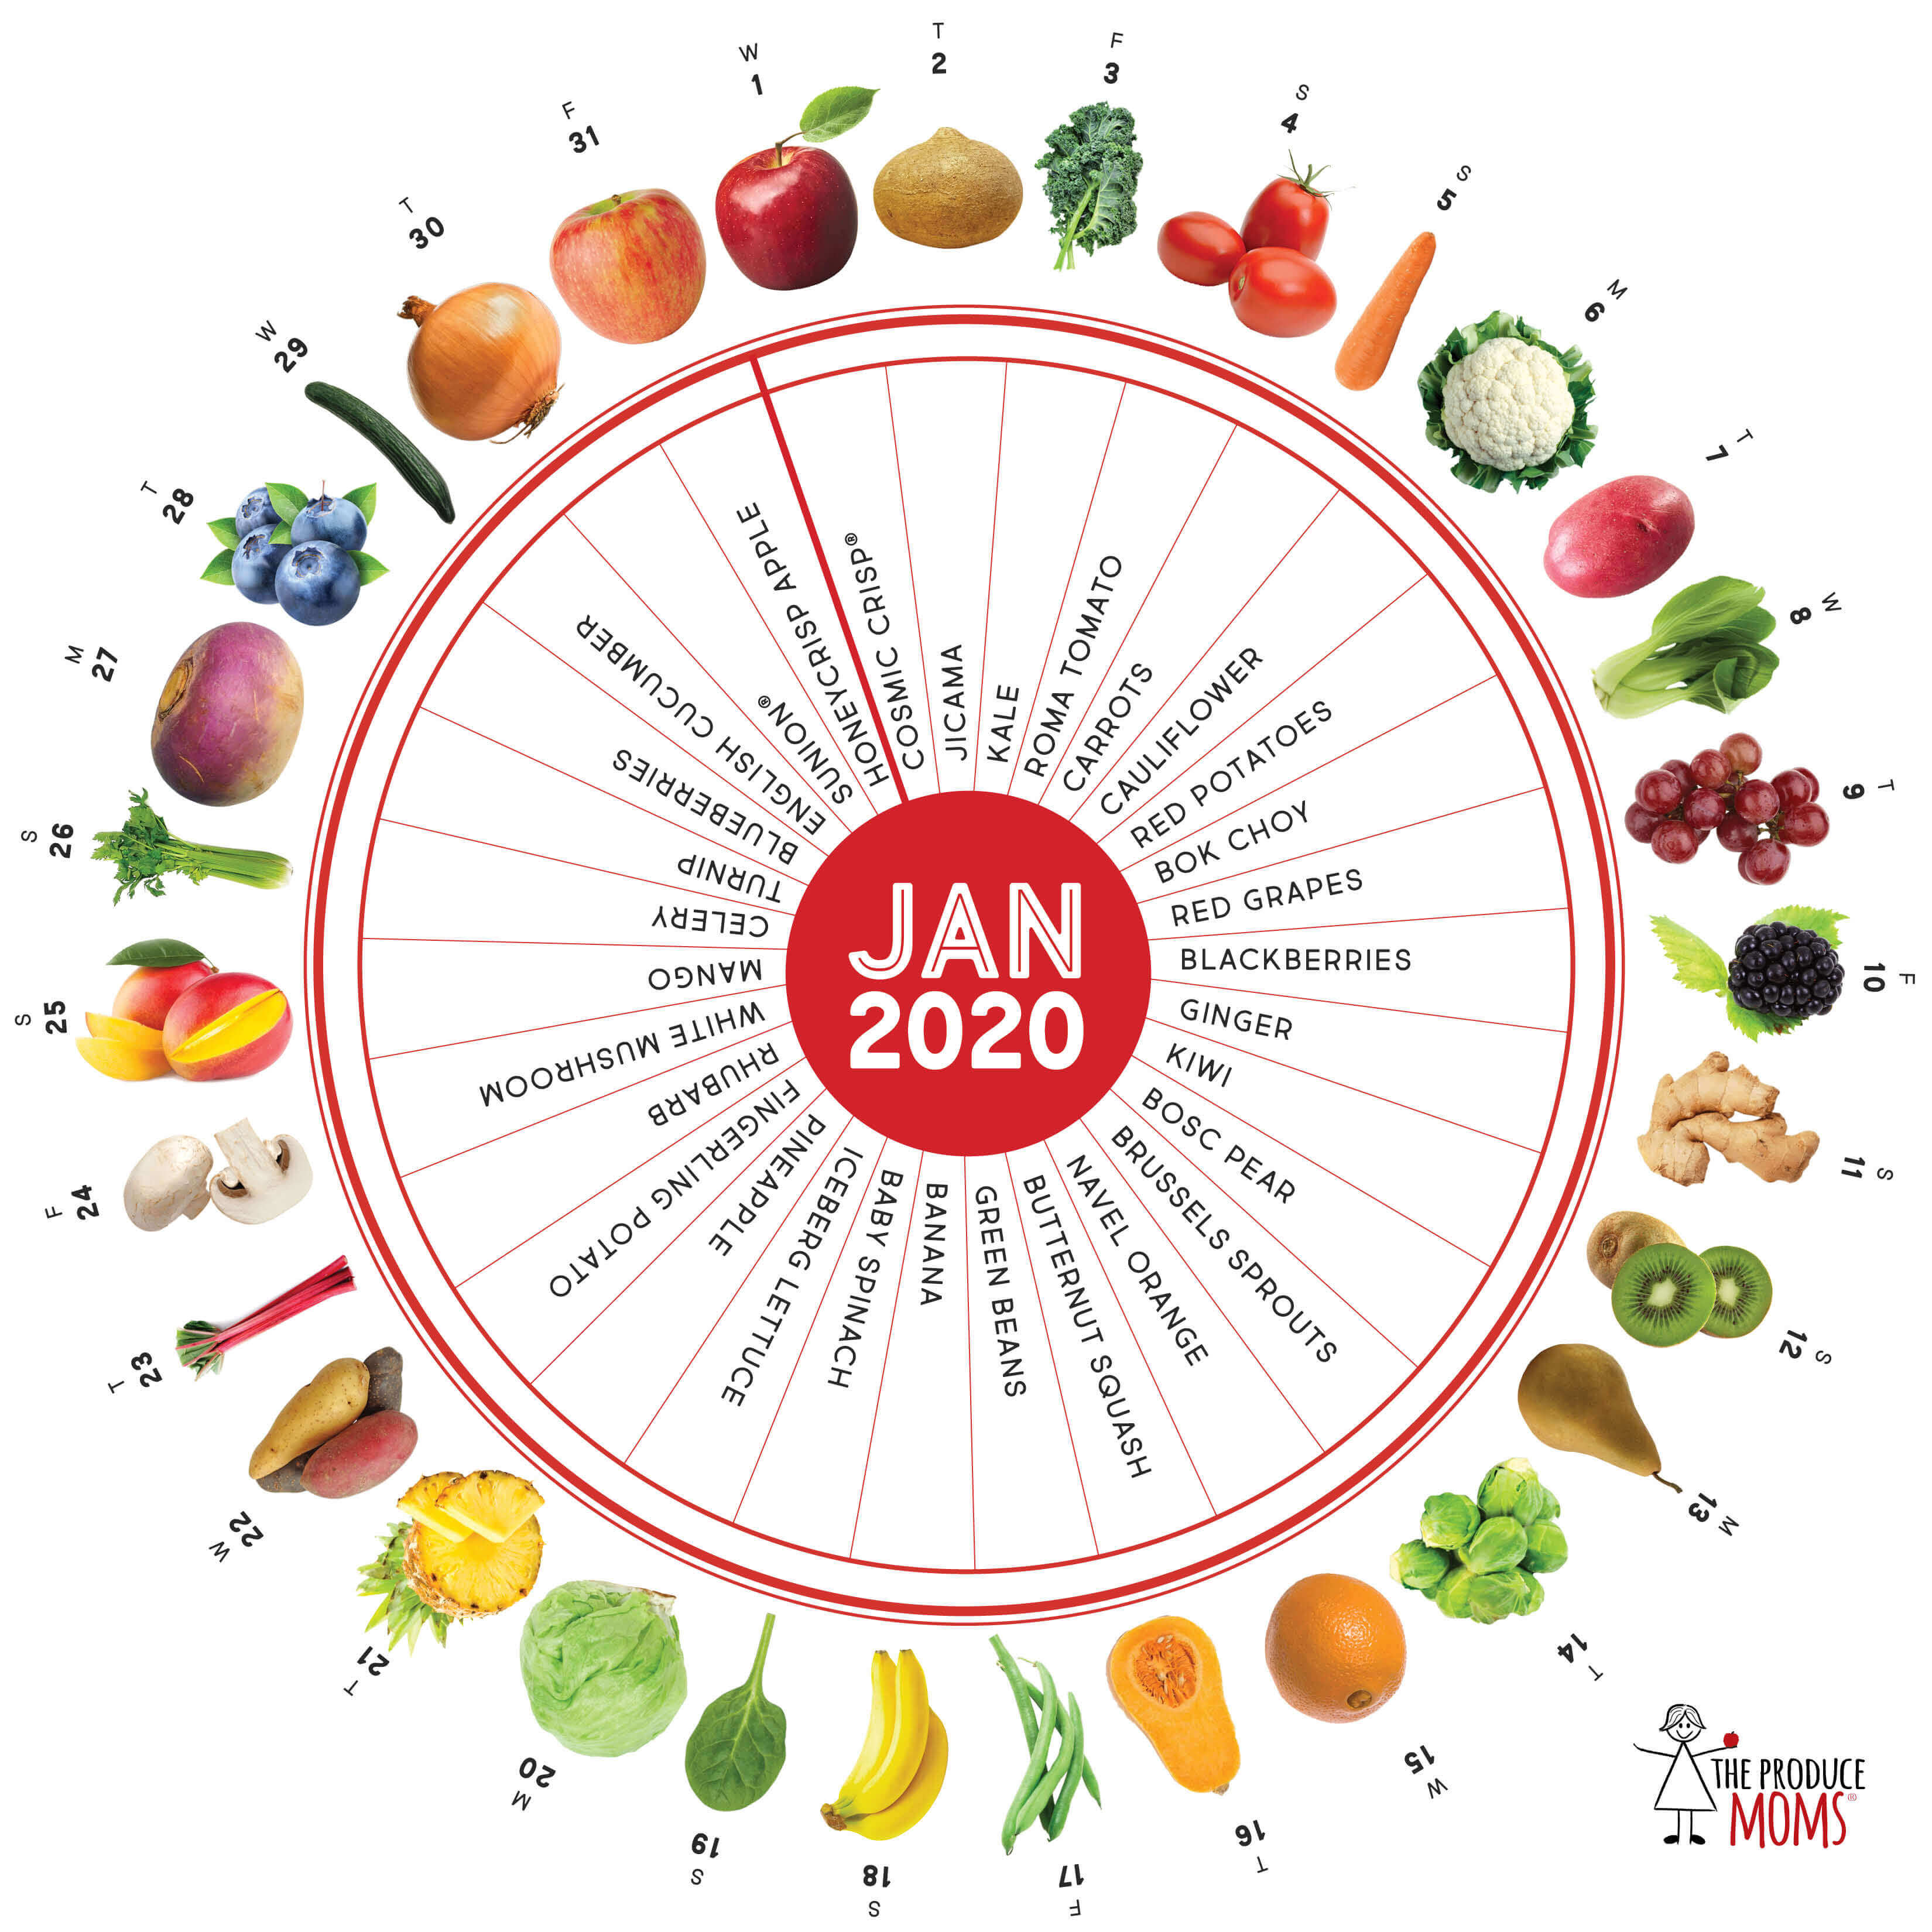 Produce Challenge